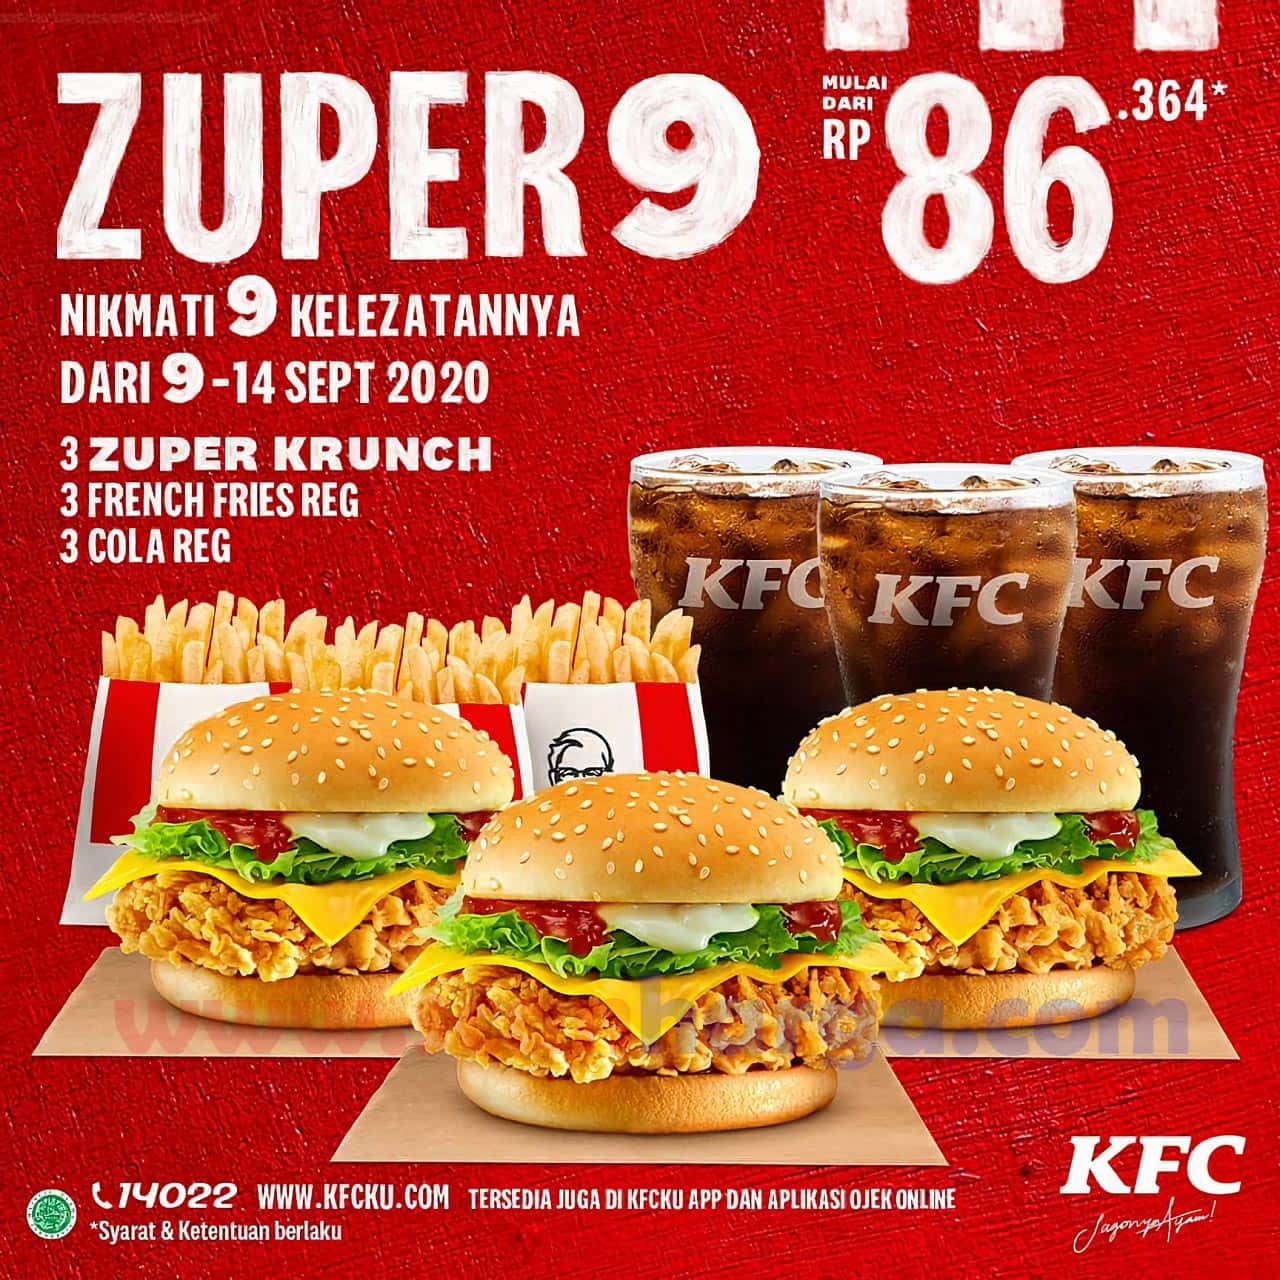 KFC ZUPER 9 Promo Paket [3 Zuper Krunch + 3 French Fries + 3 Cola Reg] Mulai Dari Rp 86.364